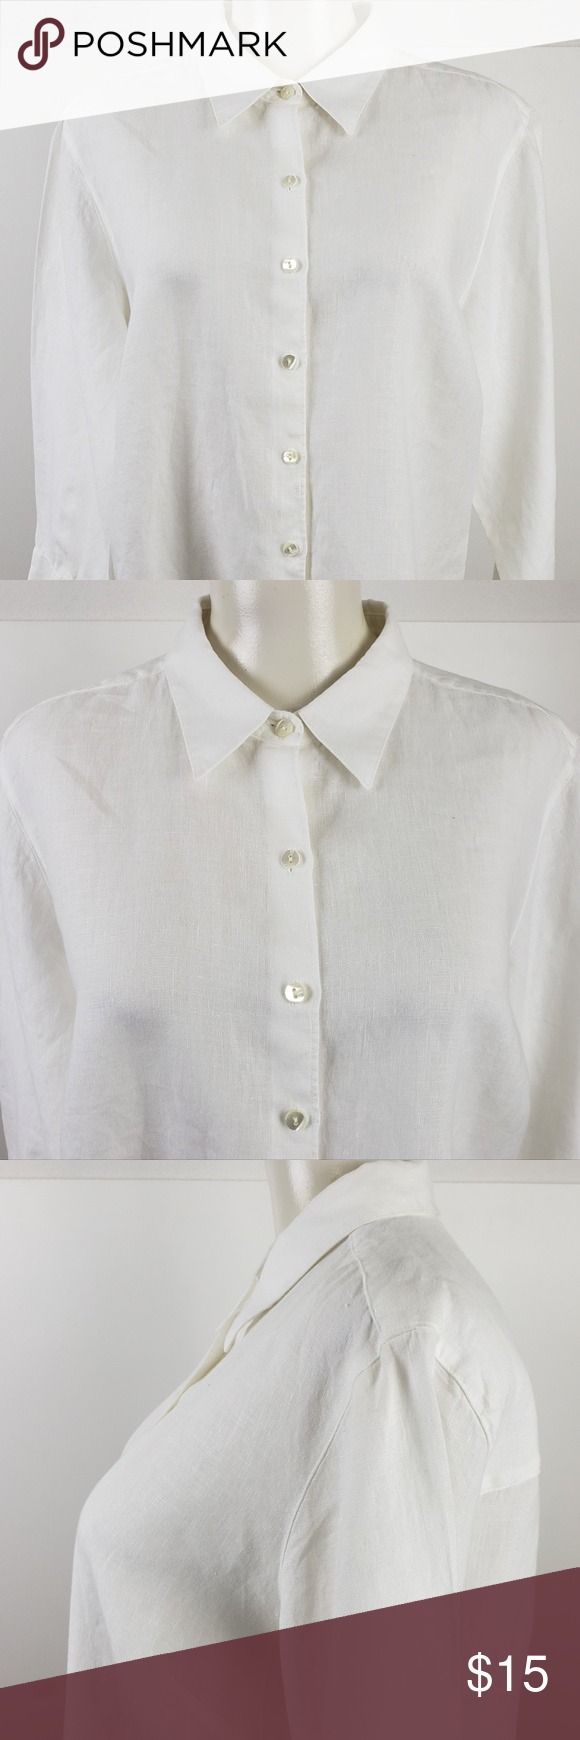 96112469cf904 LL Bean Top size Large White 3 4 Sleeve Linen LL Bean Top size Large White  Womens 3 4 Sleeve Shirt Button Down Linen Blouse Armpit to Armpit 23  Length 26 ...